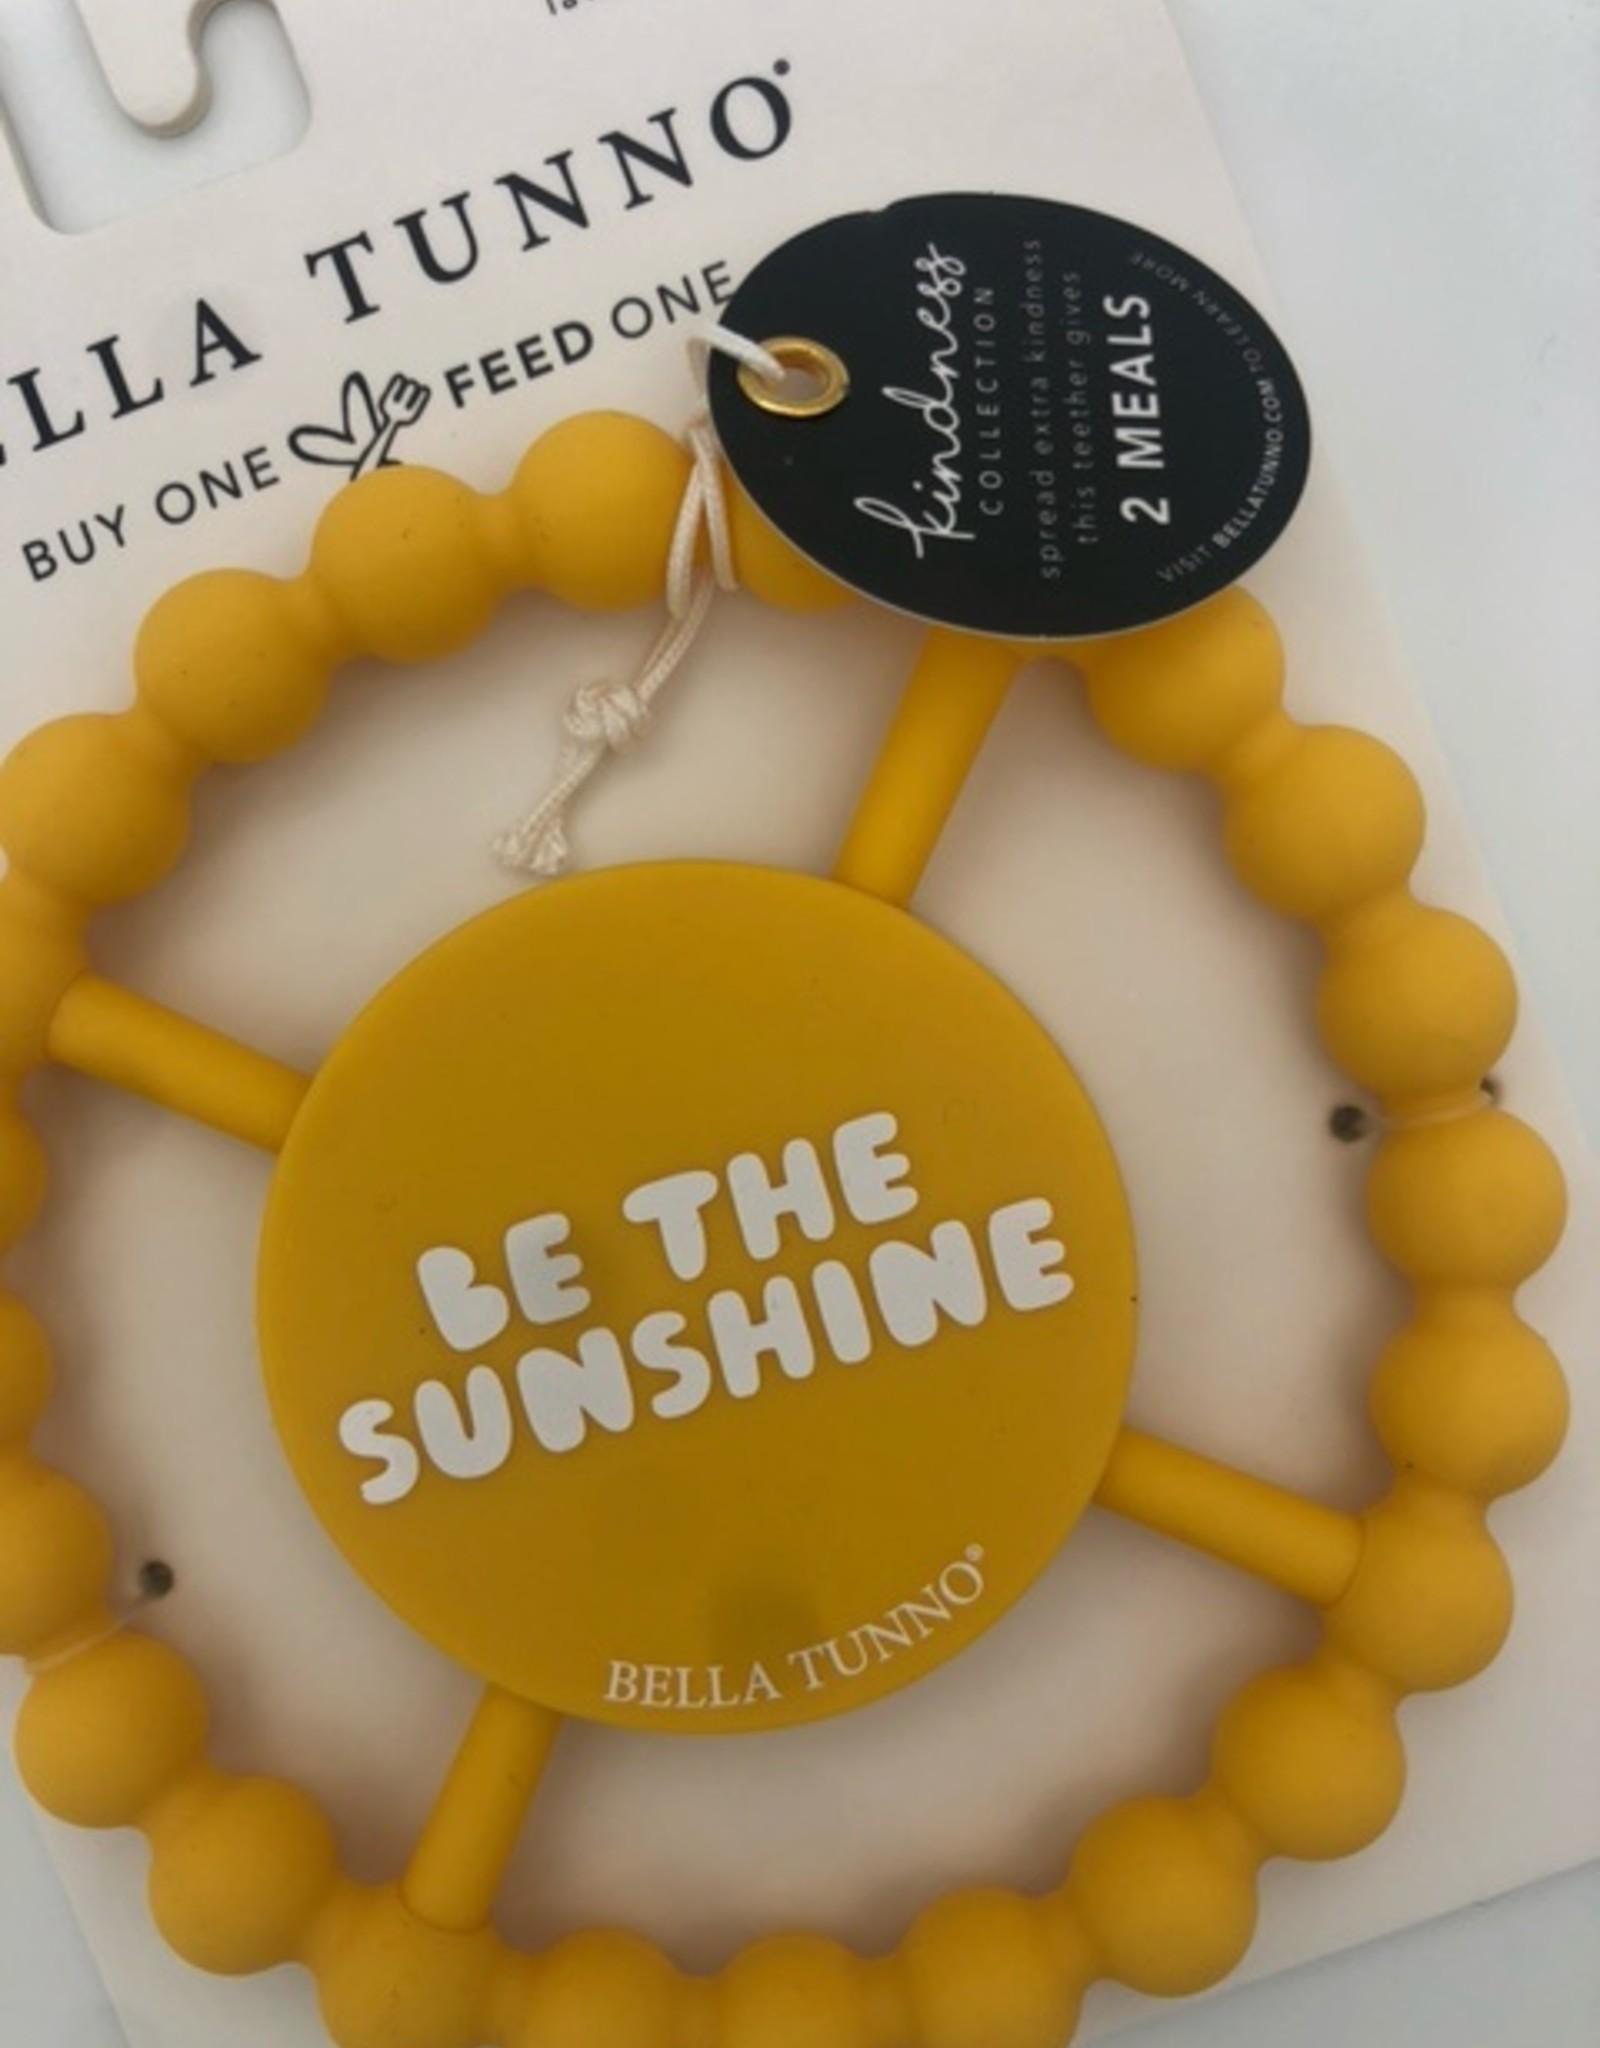 Bella Tunno Bella Tunno Happy Teether - Be the Sunshine